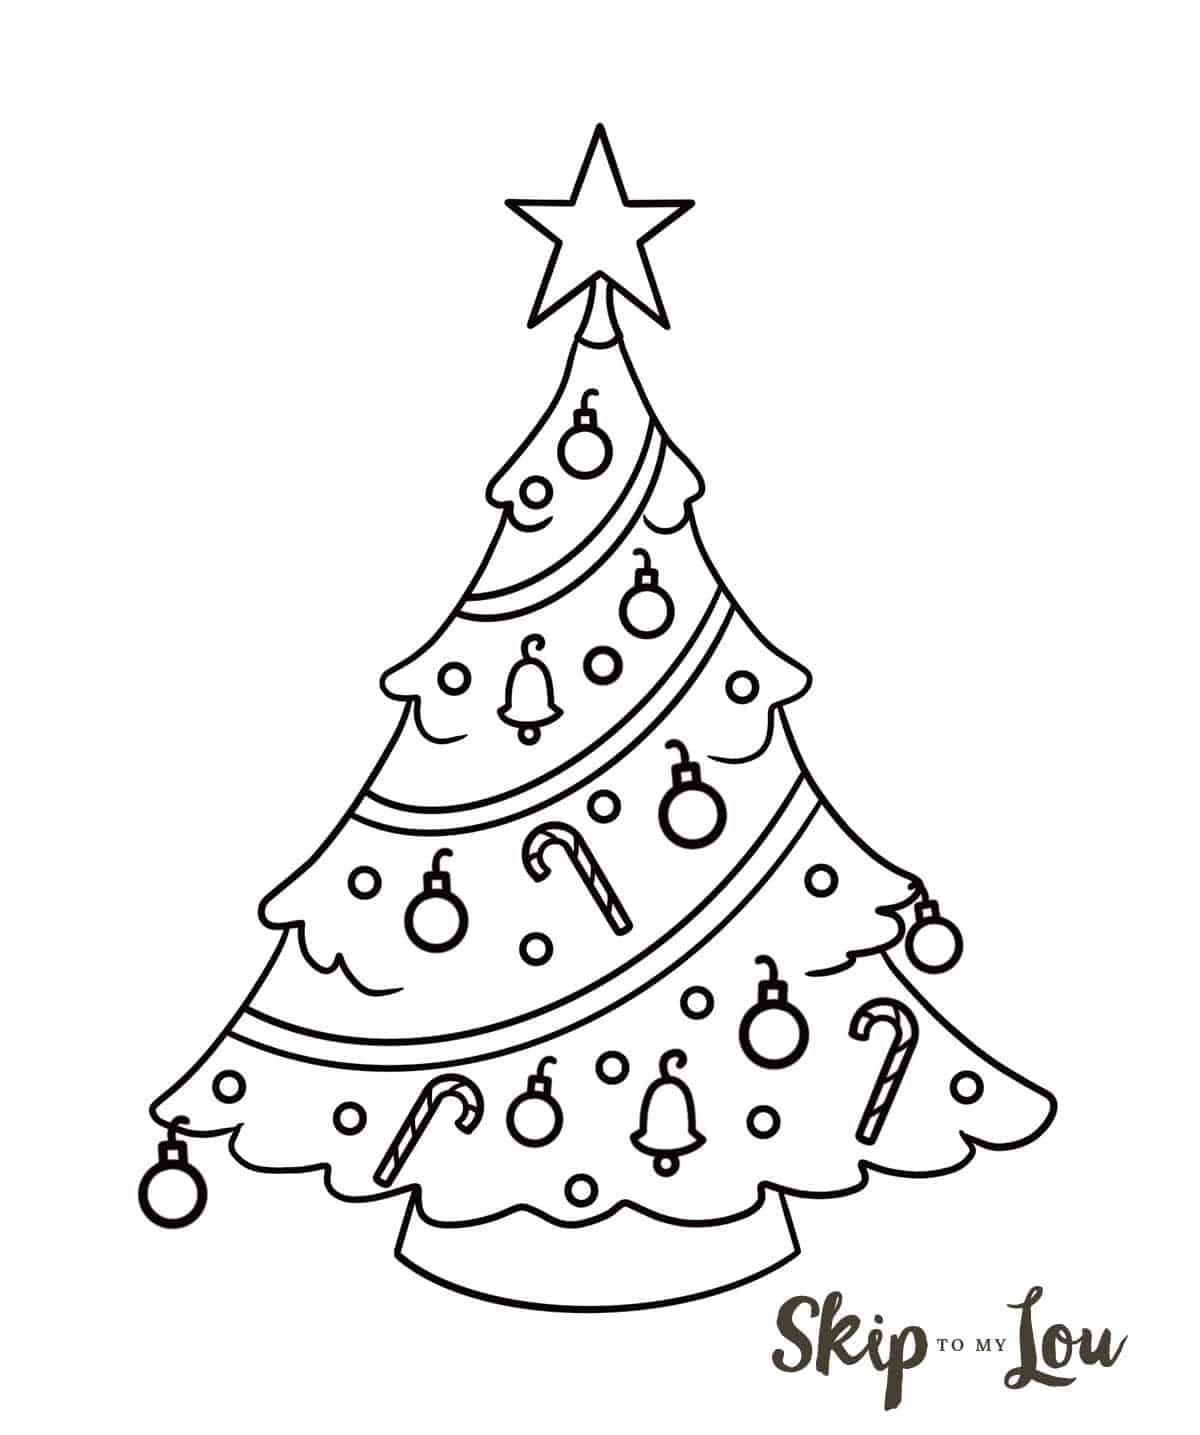 545019dfdd6e708b1753d1d8469be038 » Easy Printable Christmas Tree Drawing